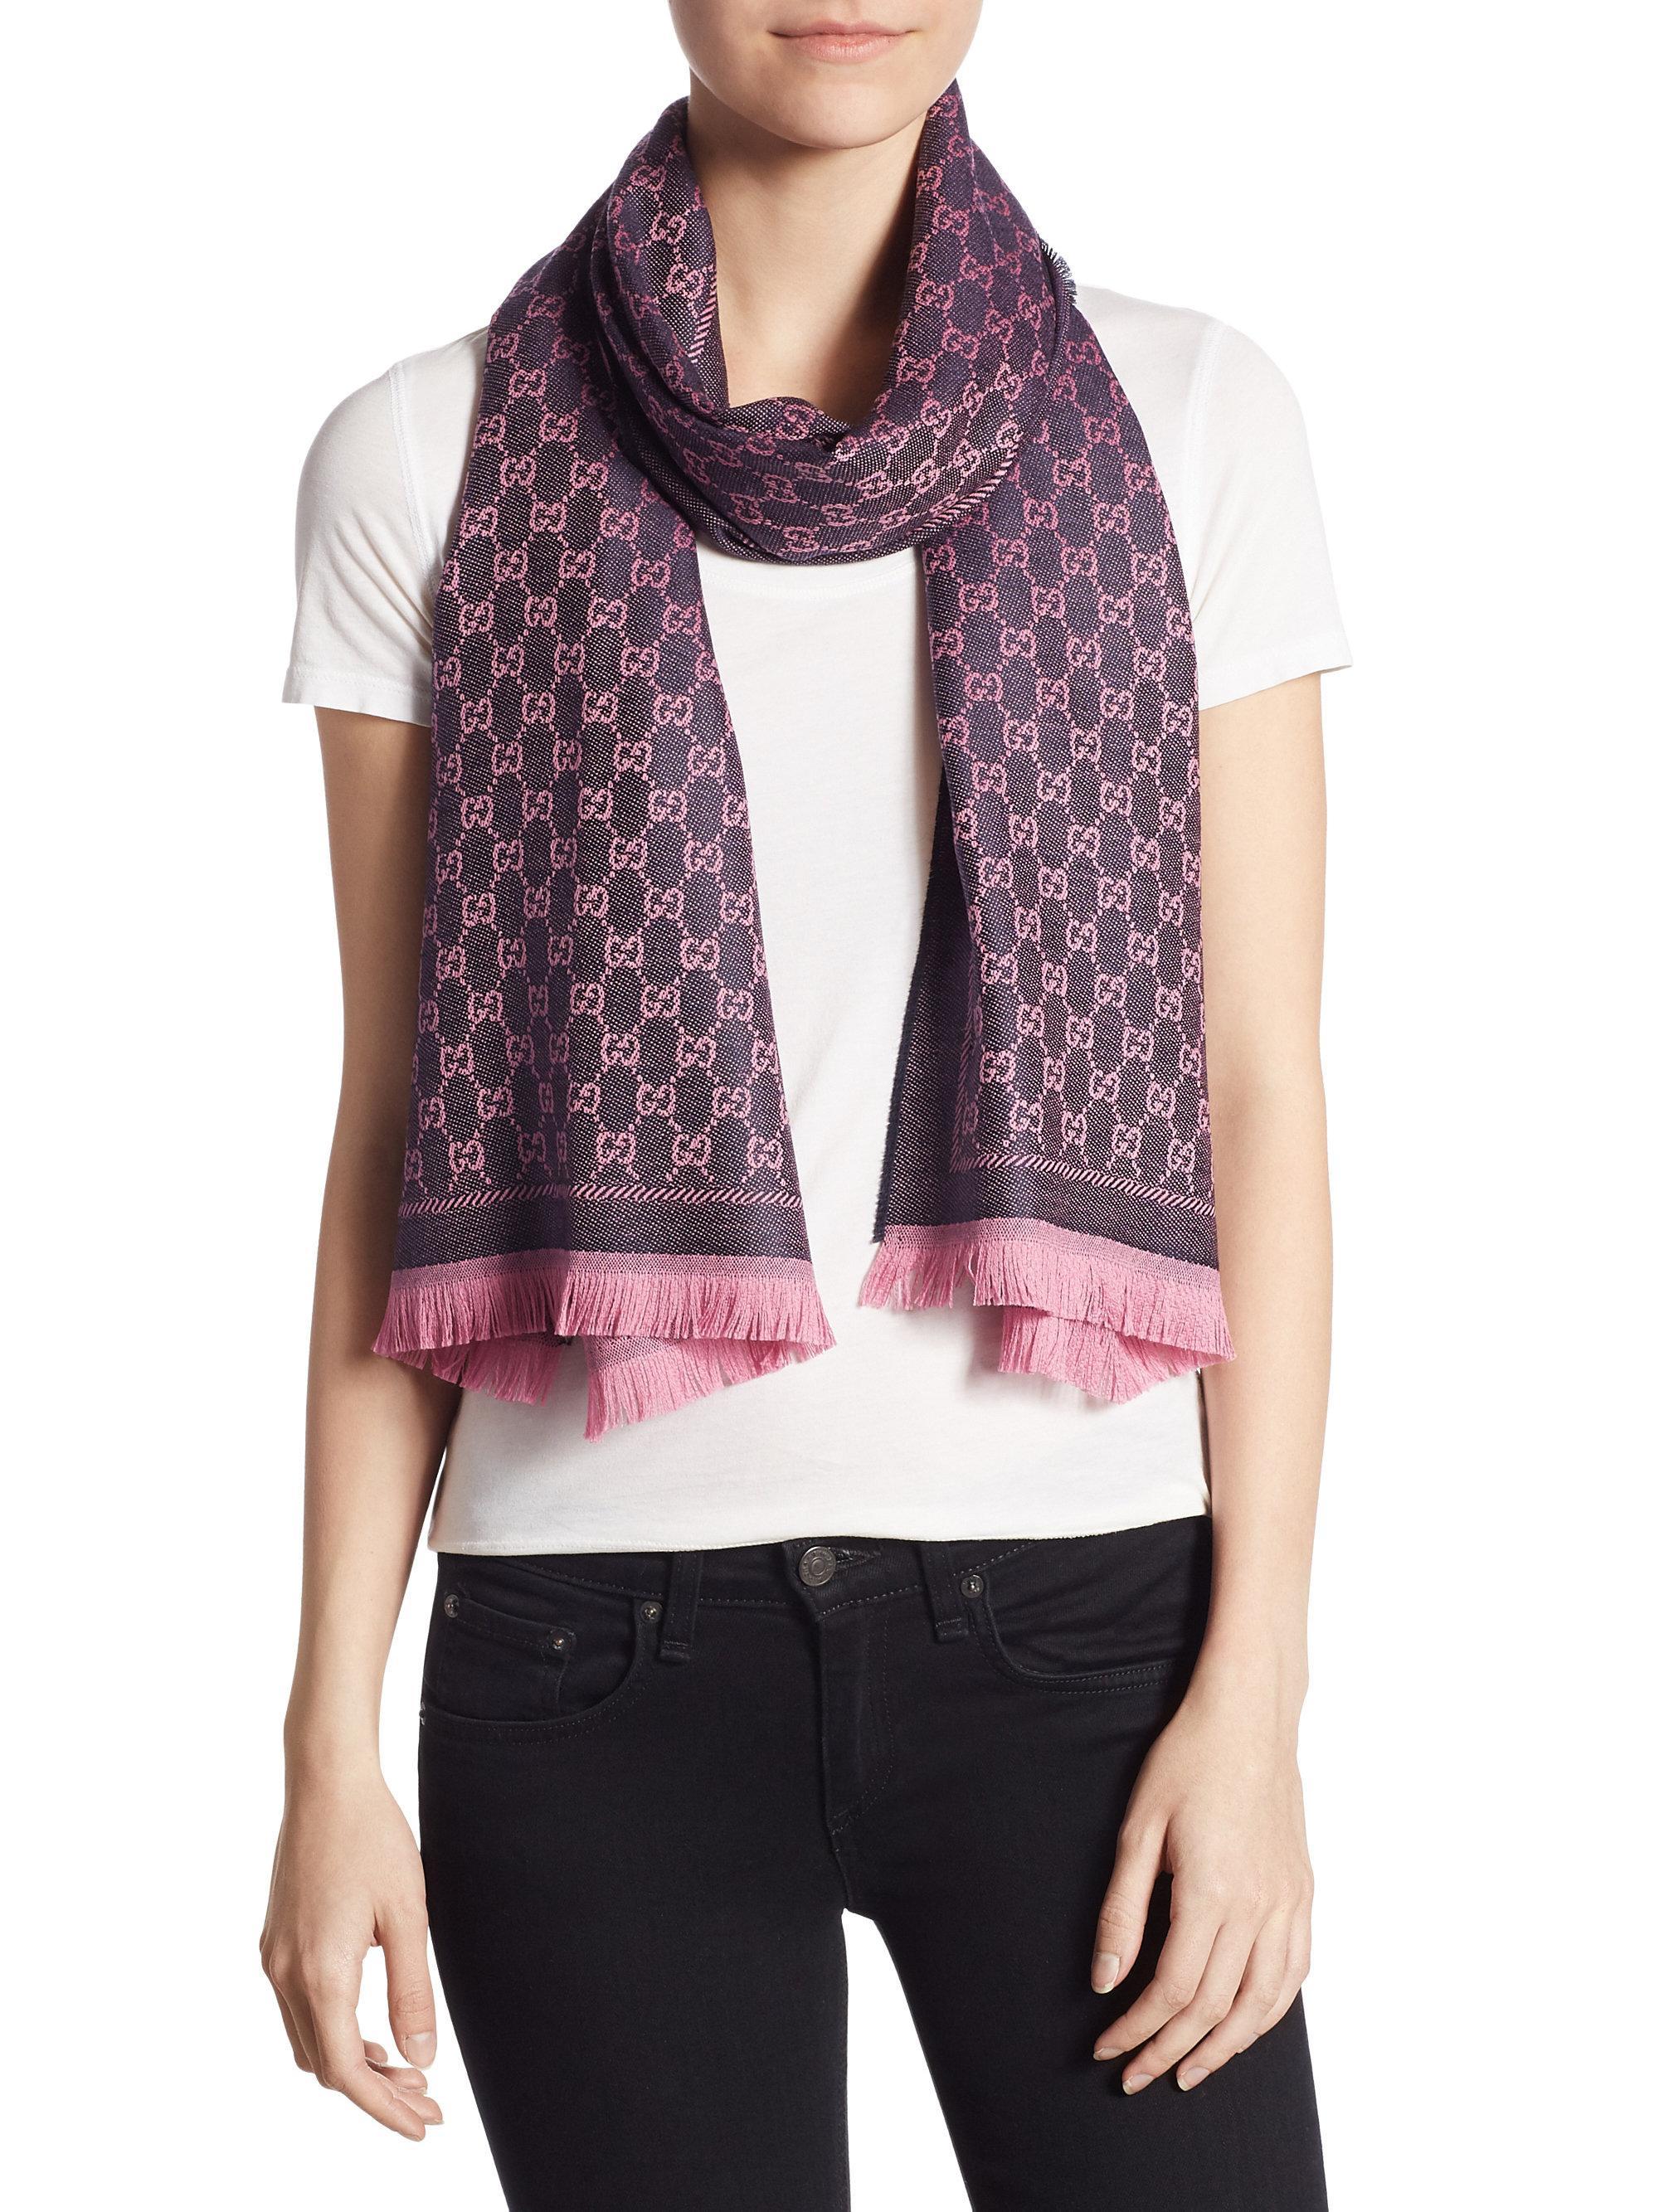 6c95cd0f79c Lyst - Gucci New Sten Gg Wool Scarf in Pink